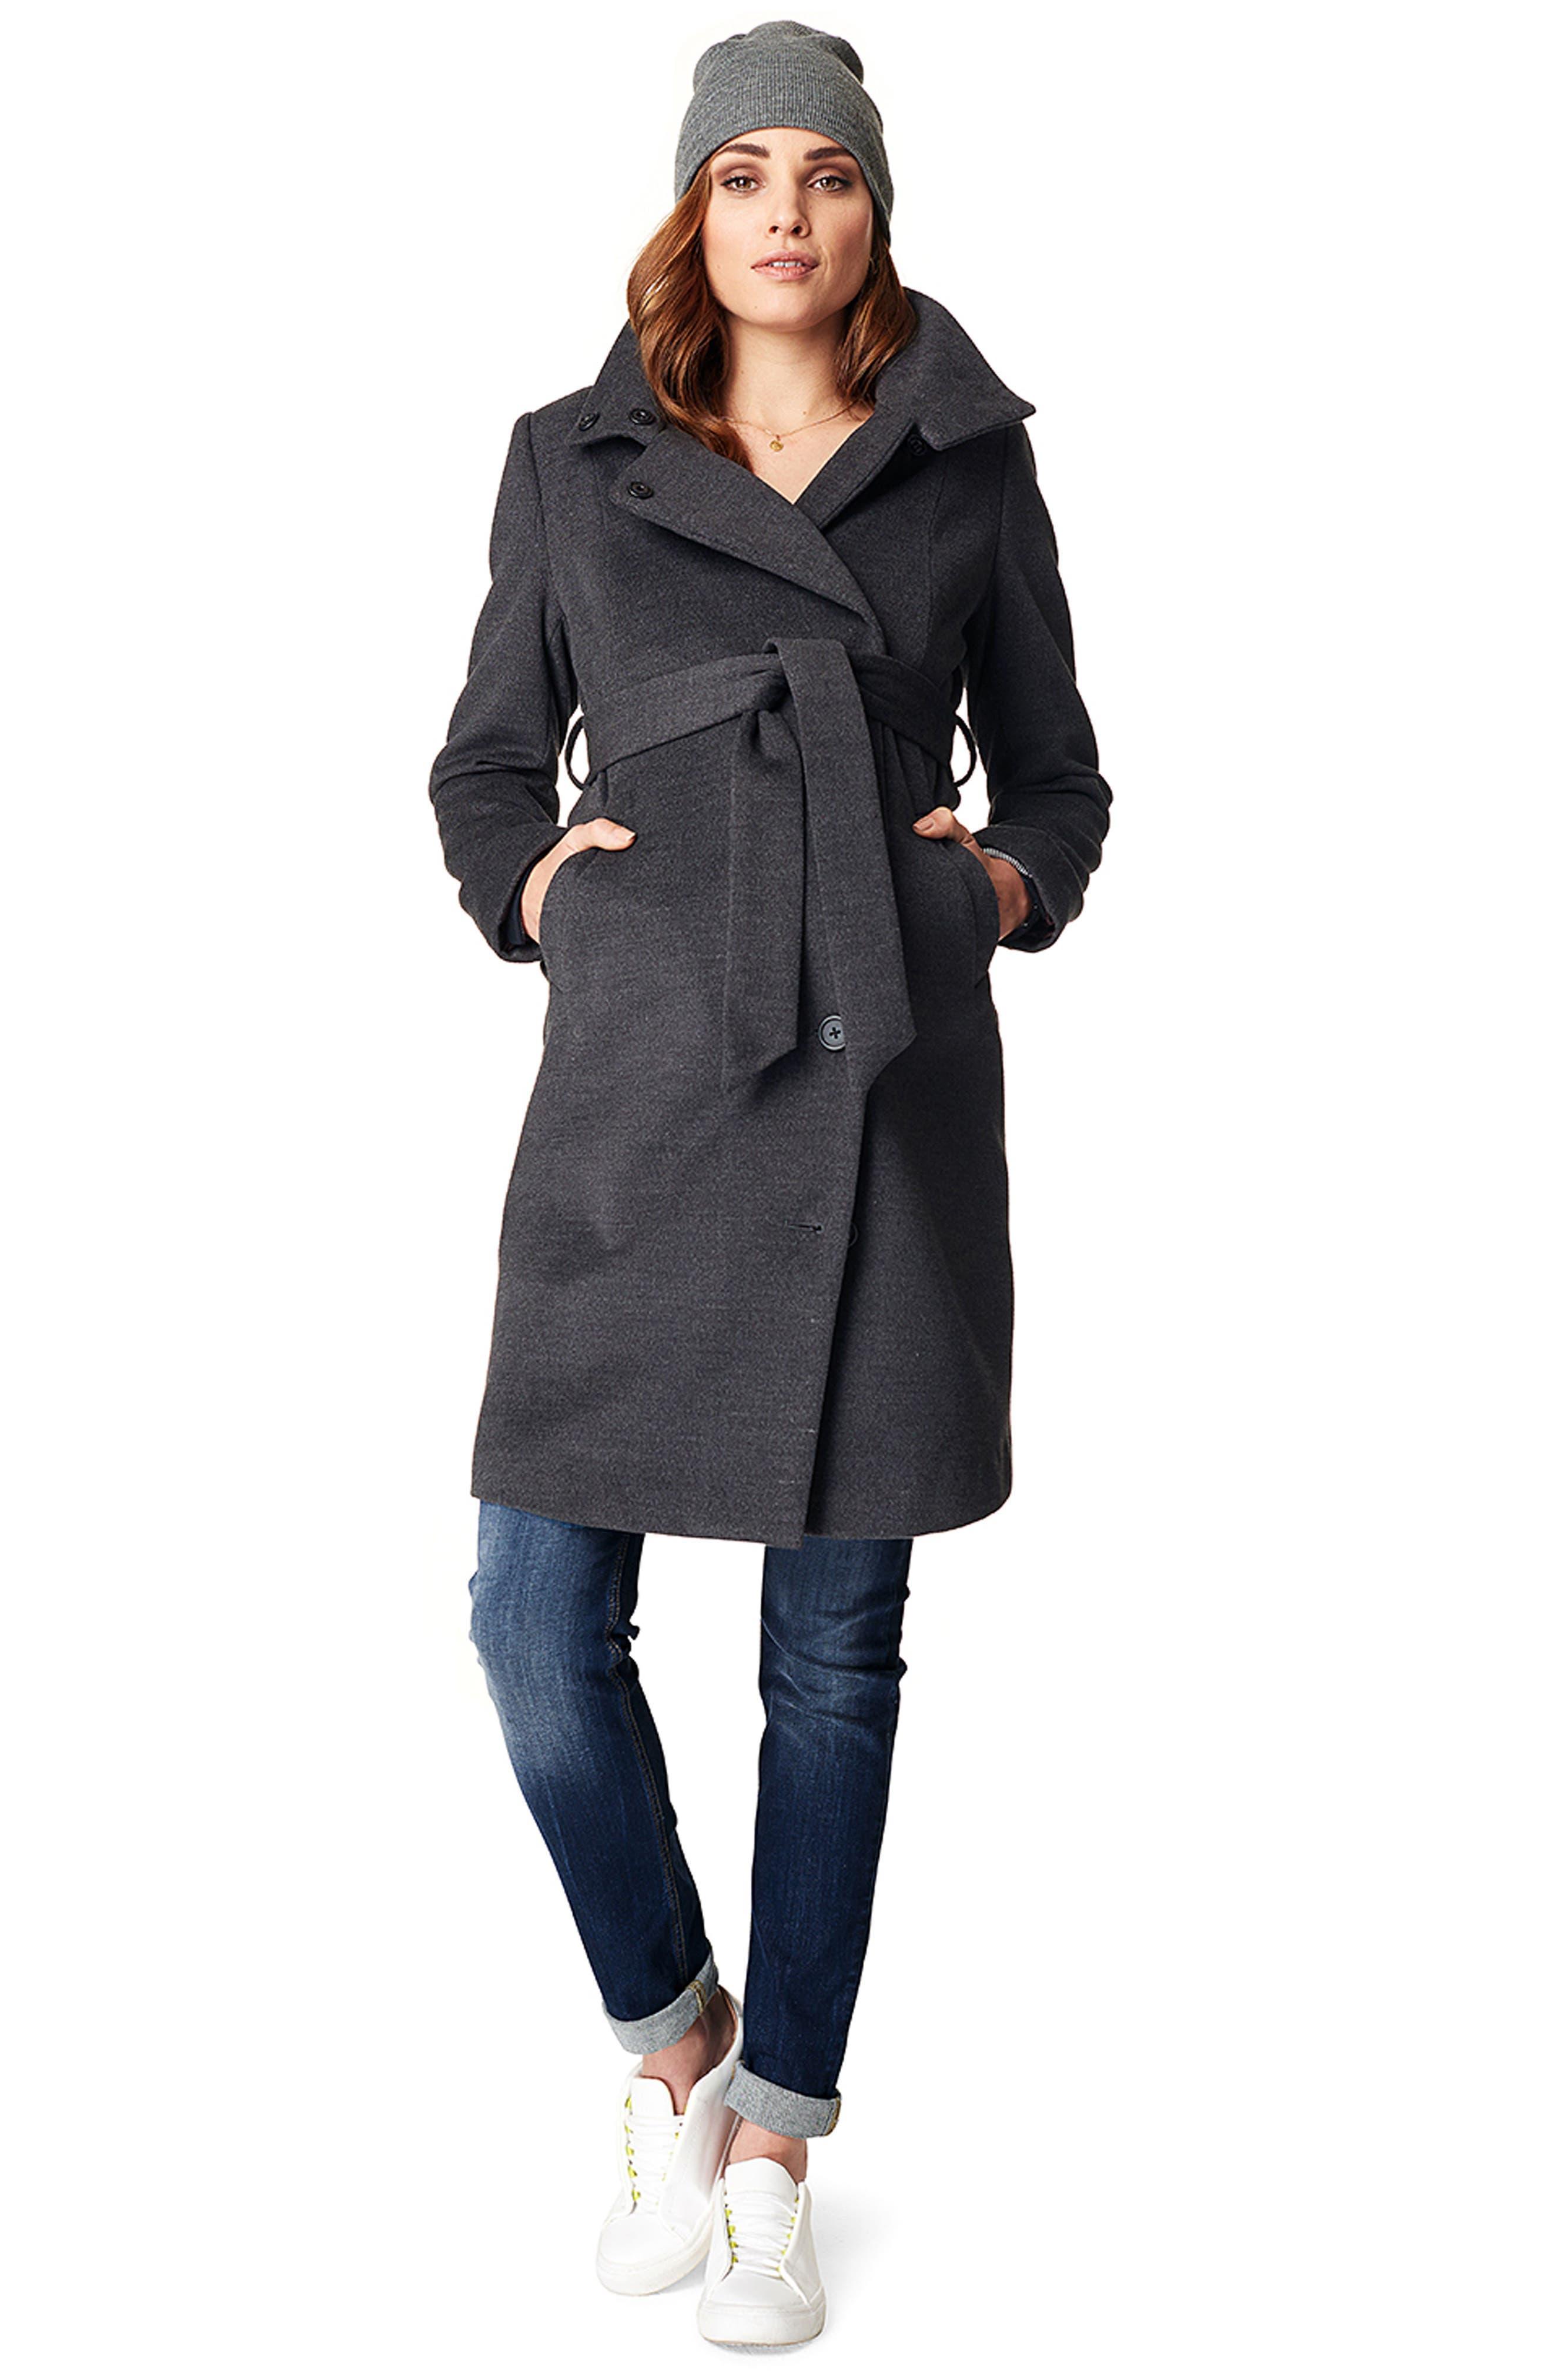 Ilena 2 Maternity Coat,                             Alternate thumbnail 5, color,                             BLACK MELANGE